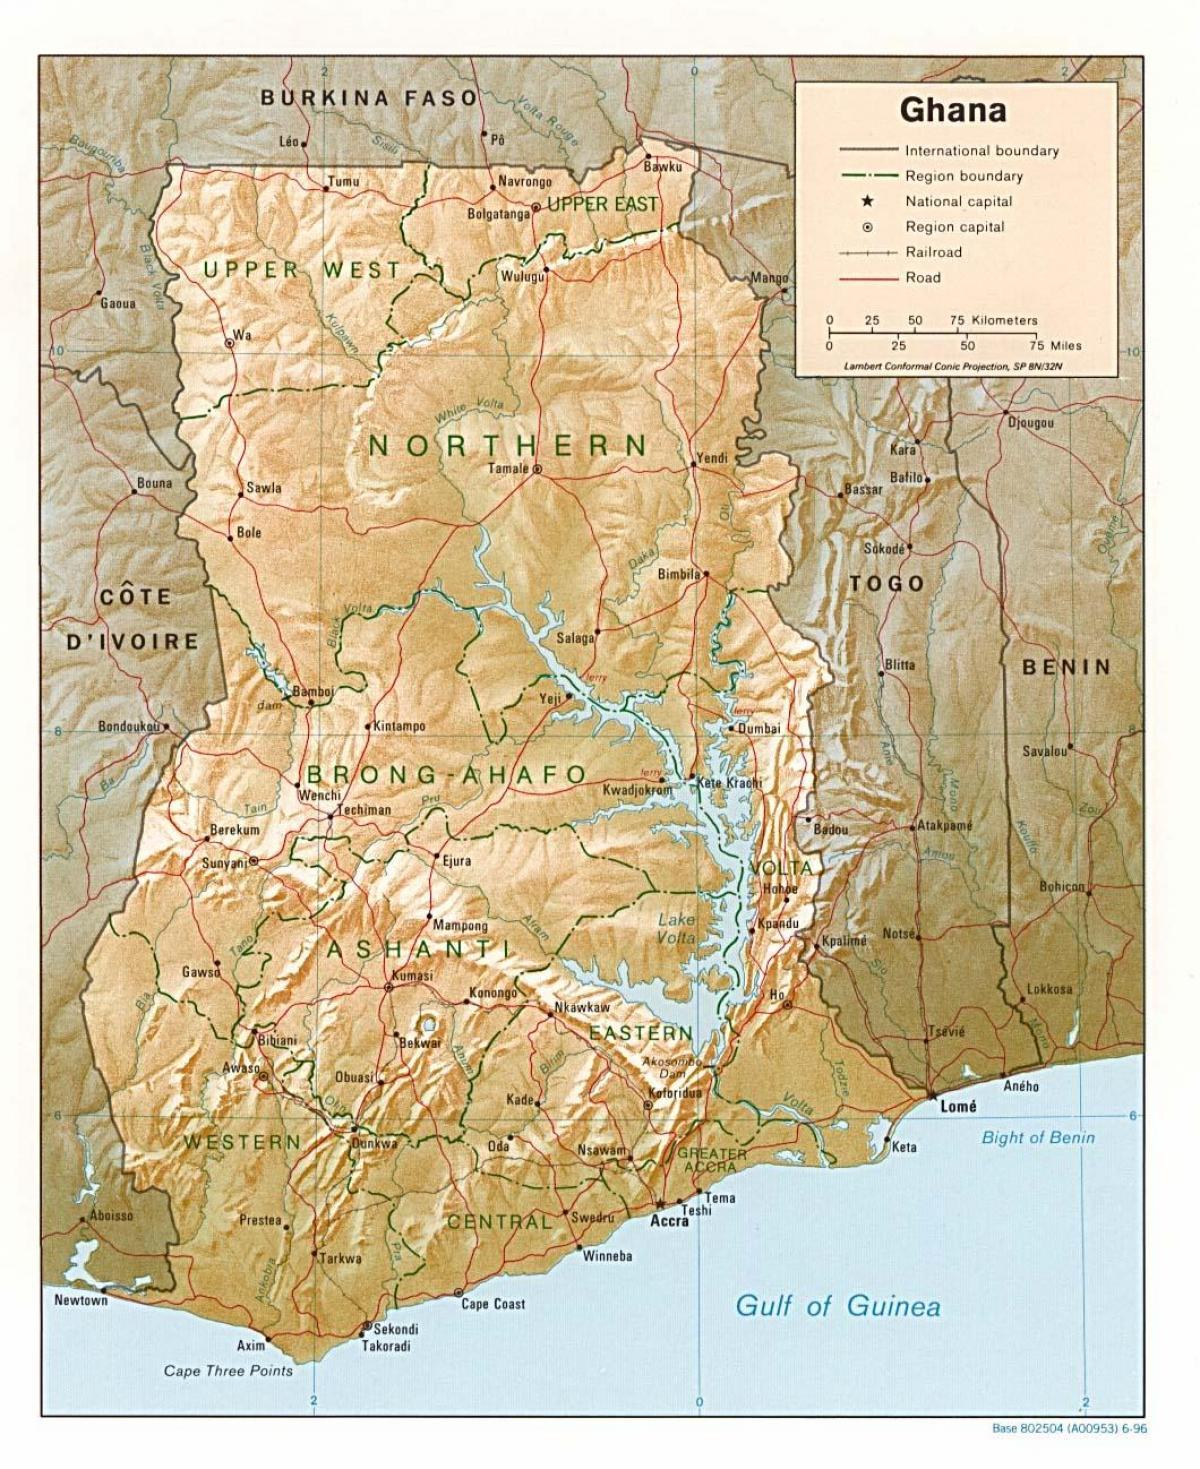 Africa Occidentale Cartina Geografica.Ghana Geografia Cartina Mappa Geografica Del Ghana Africa Occidentale Africa